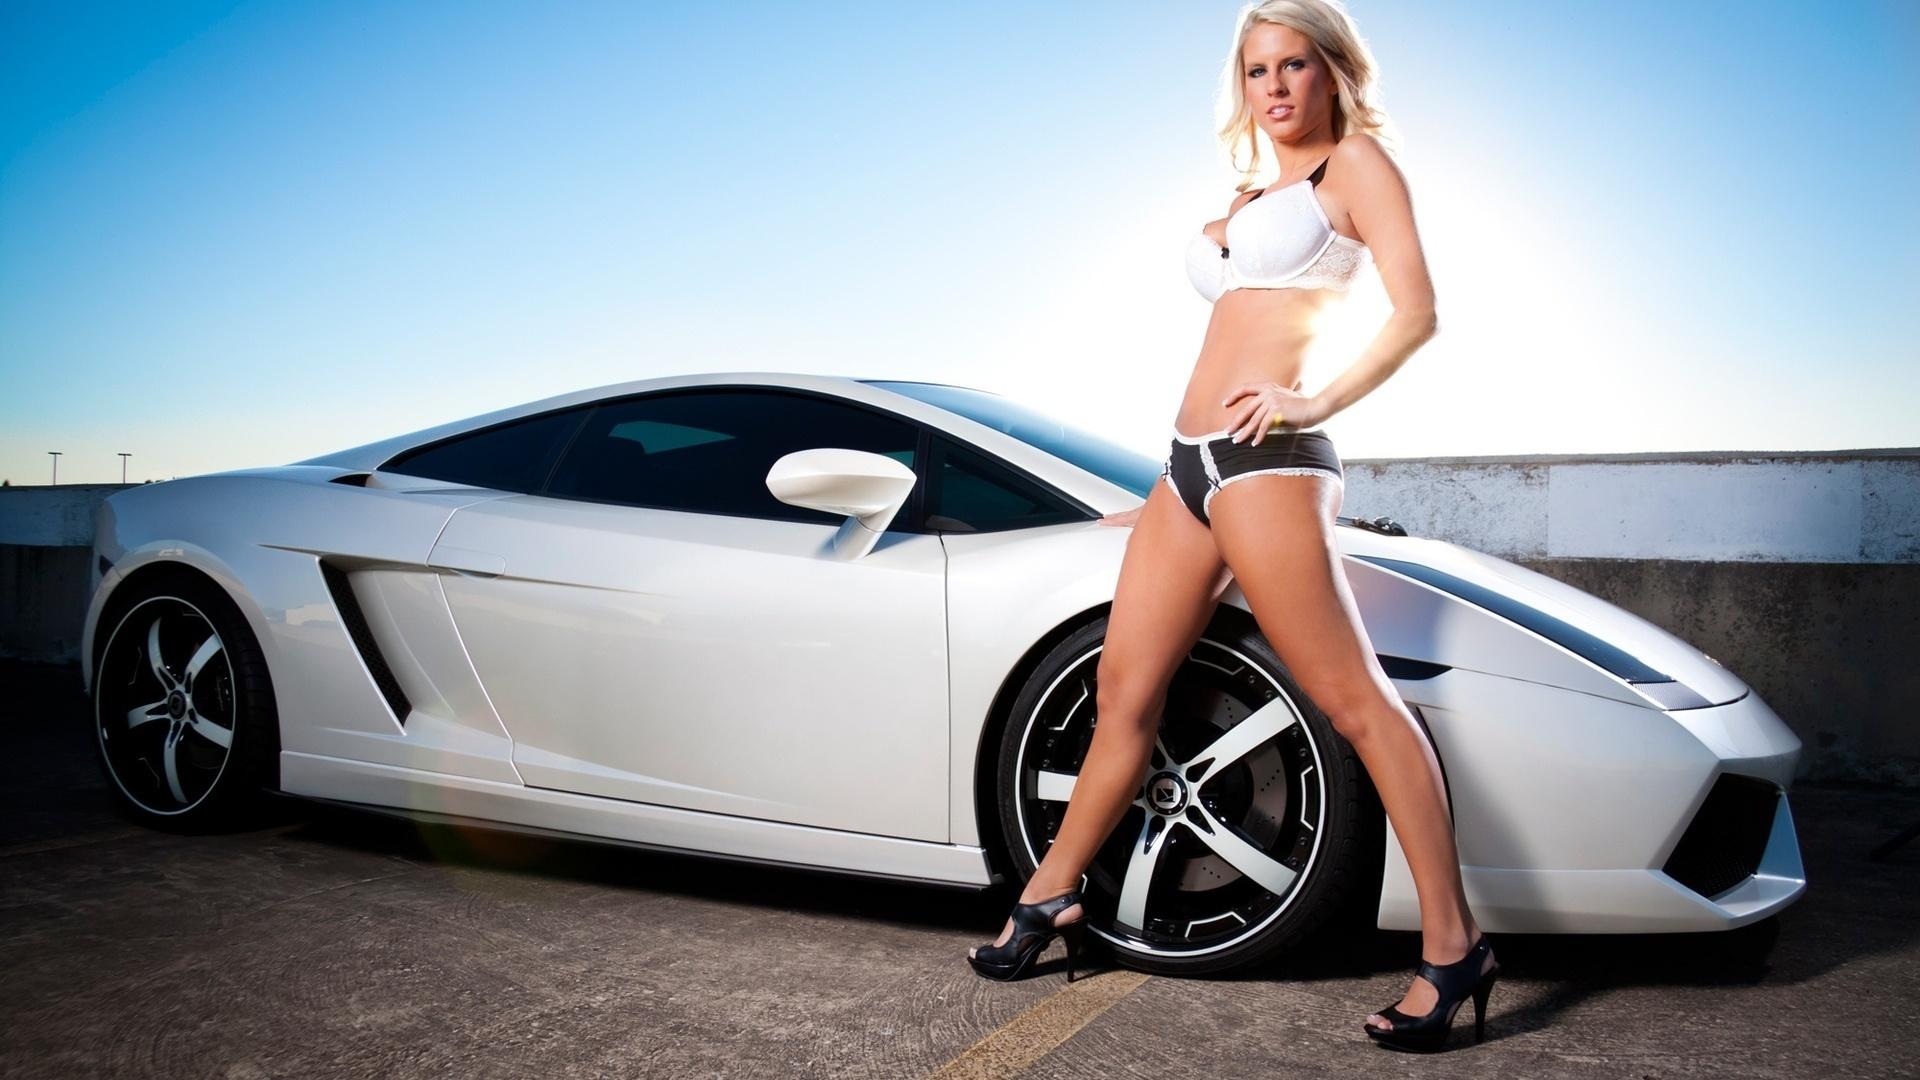 Erotic amateur photo mature women